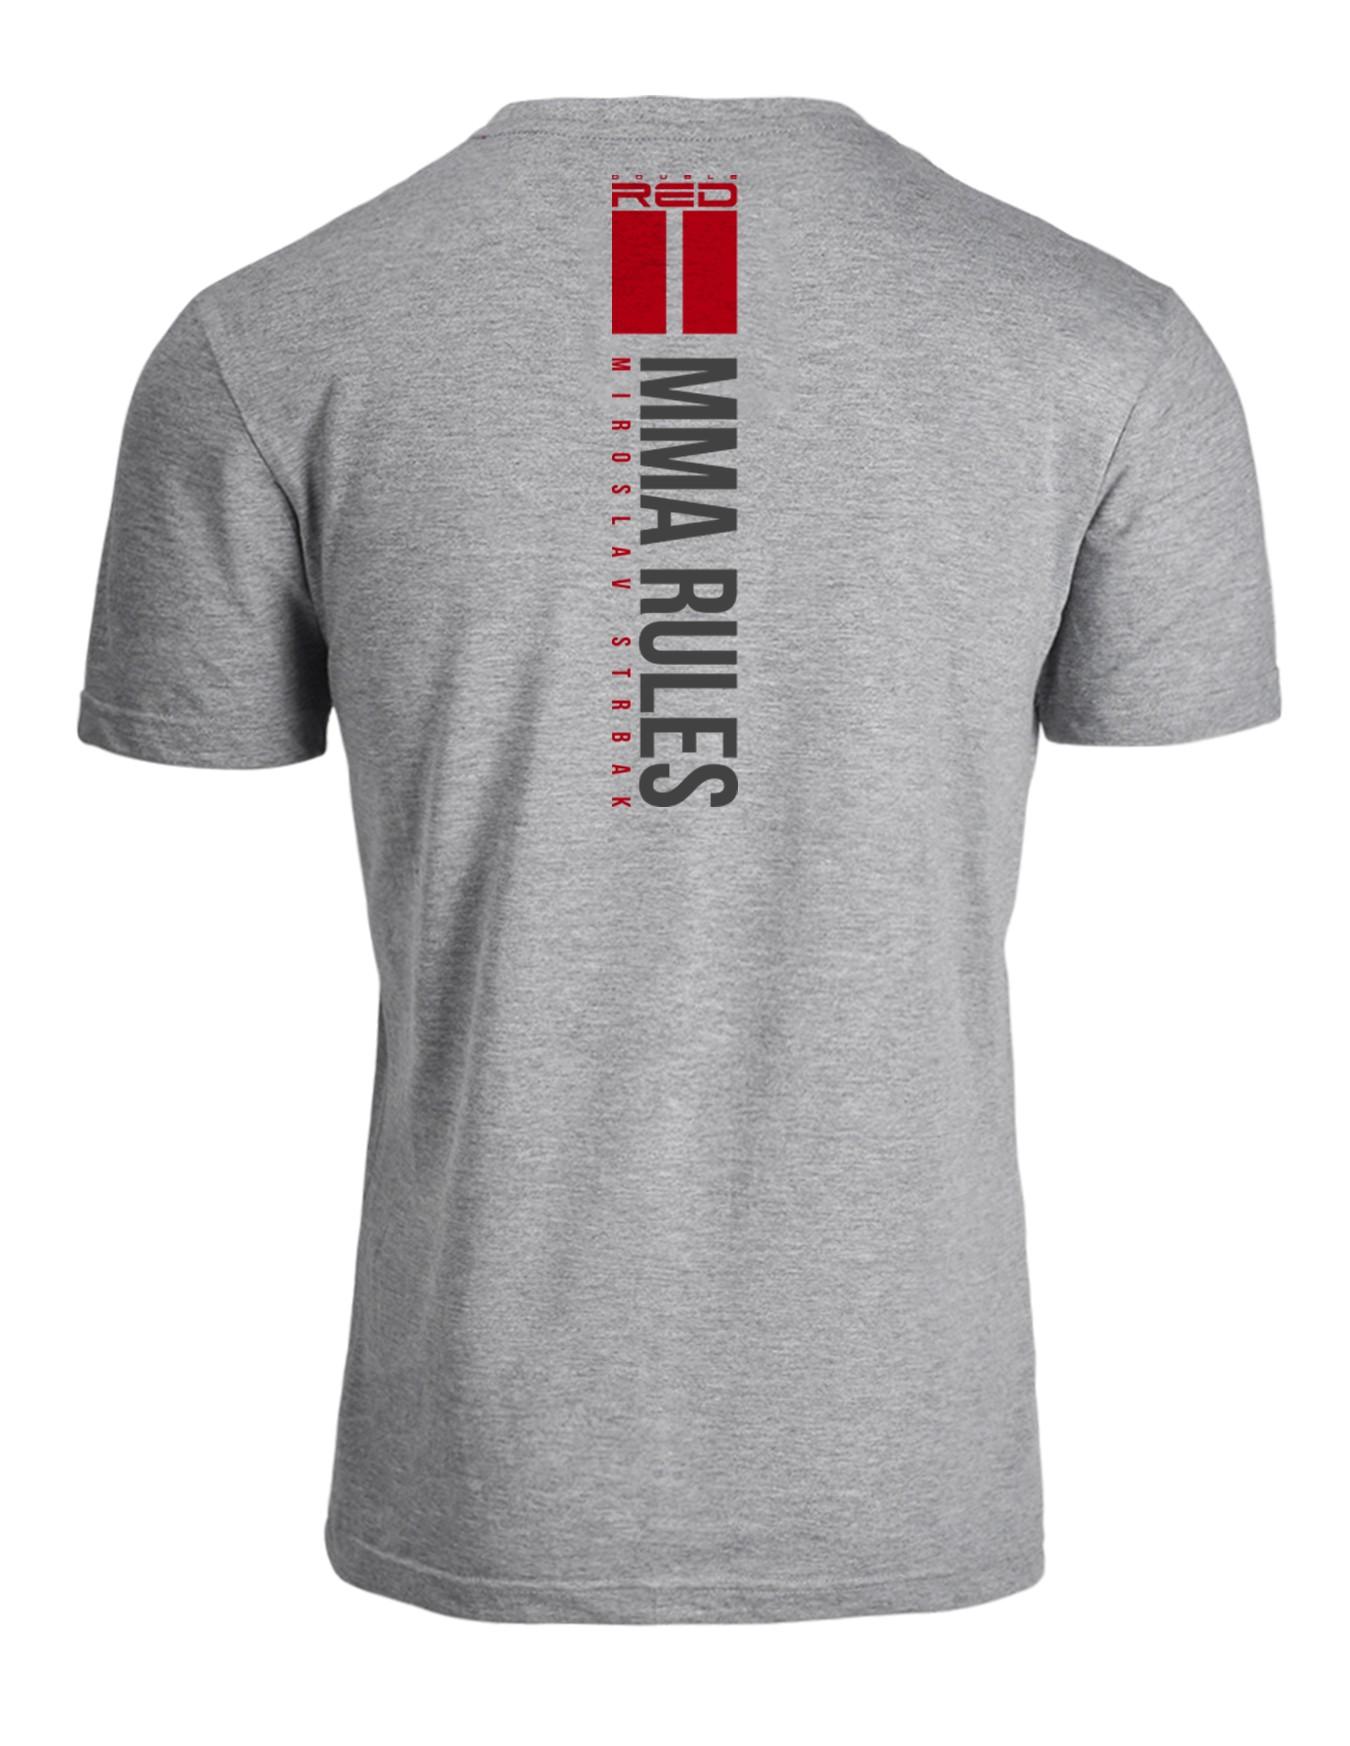 Limited Edition Miroslav Štrbák T-Shirt Slim Fit